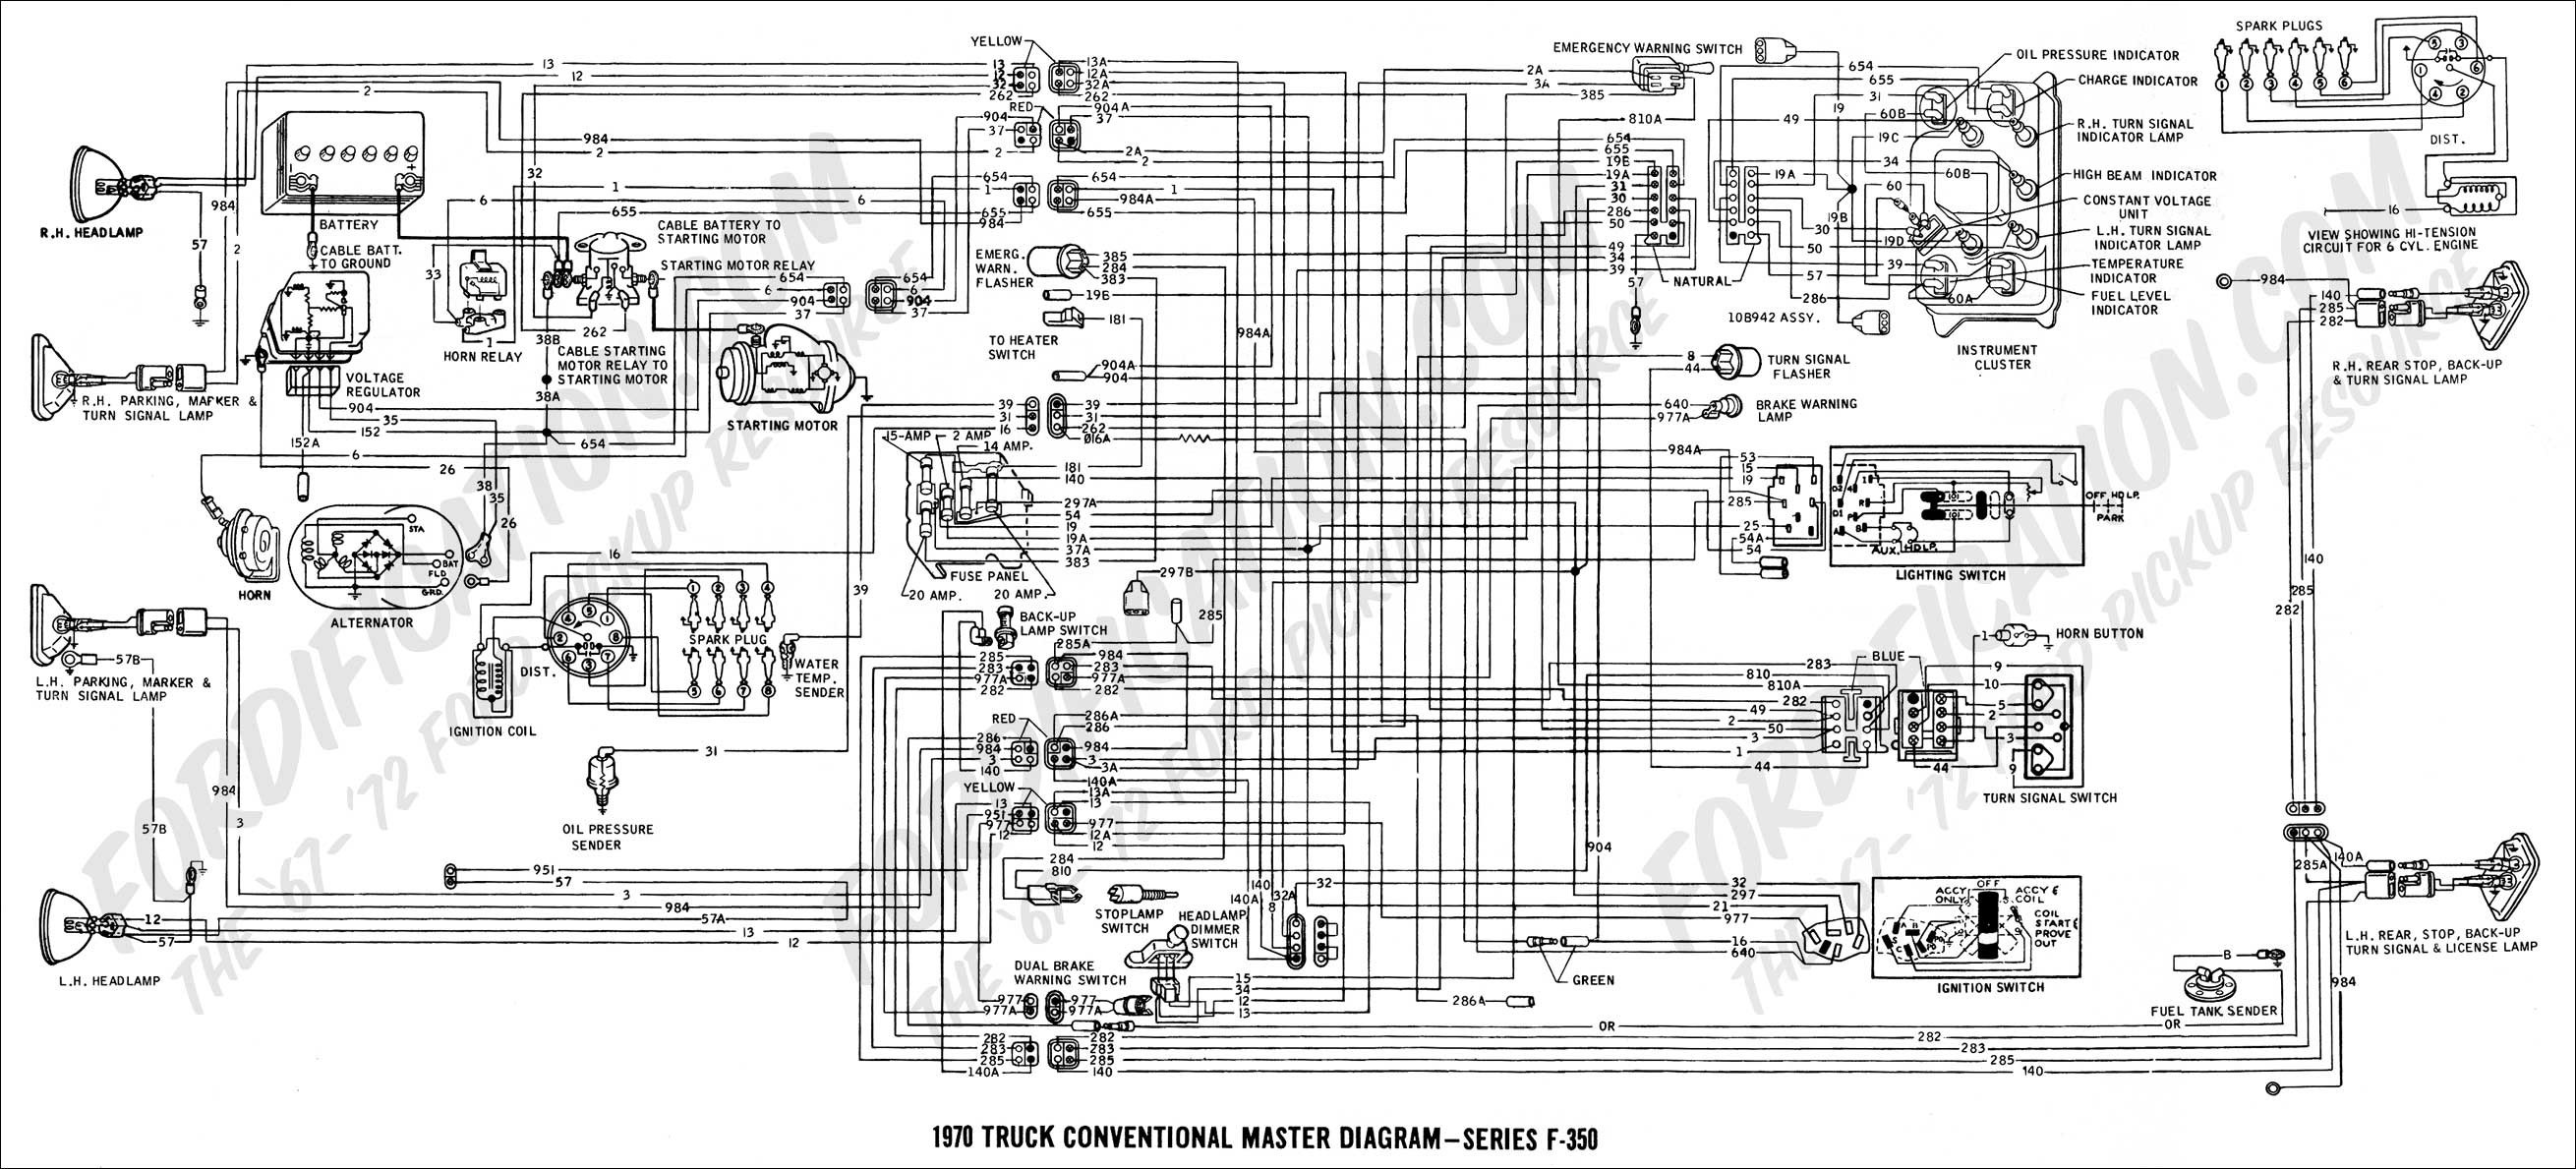 6 0 L Powerstroke Engine Diagram 1997 7 3l Engine Diagram Experts Wiring Diagram • Of 6 0 L Powerstroke Engine Diagram